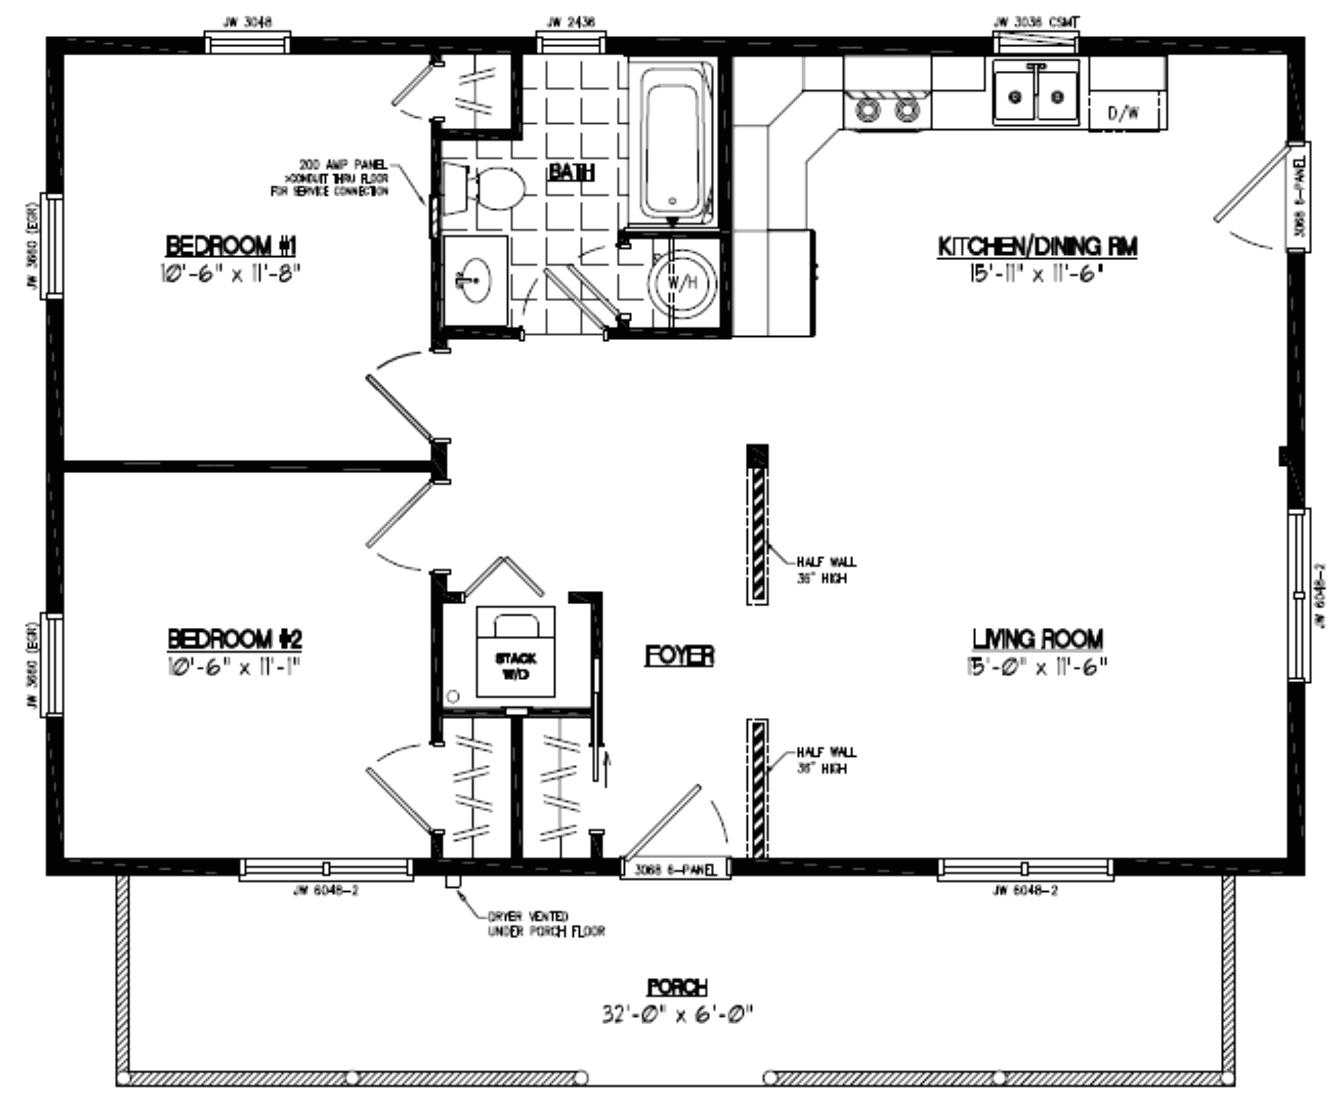 24x36 ranch house plans fresh fresh 24 x 36 2 bedroom house plans house plan